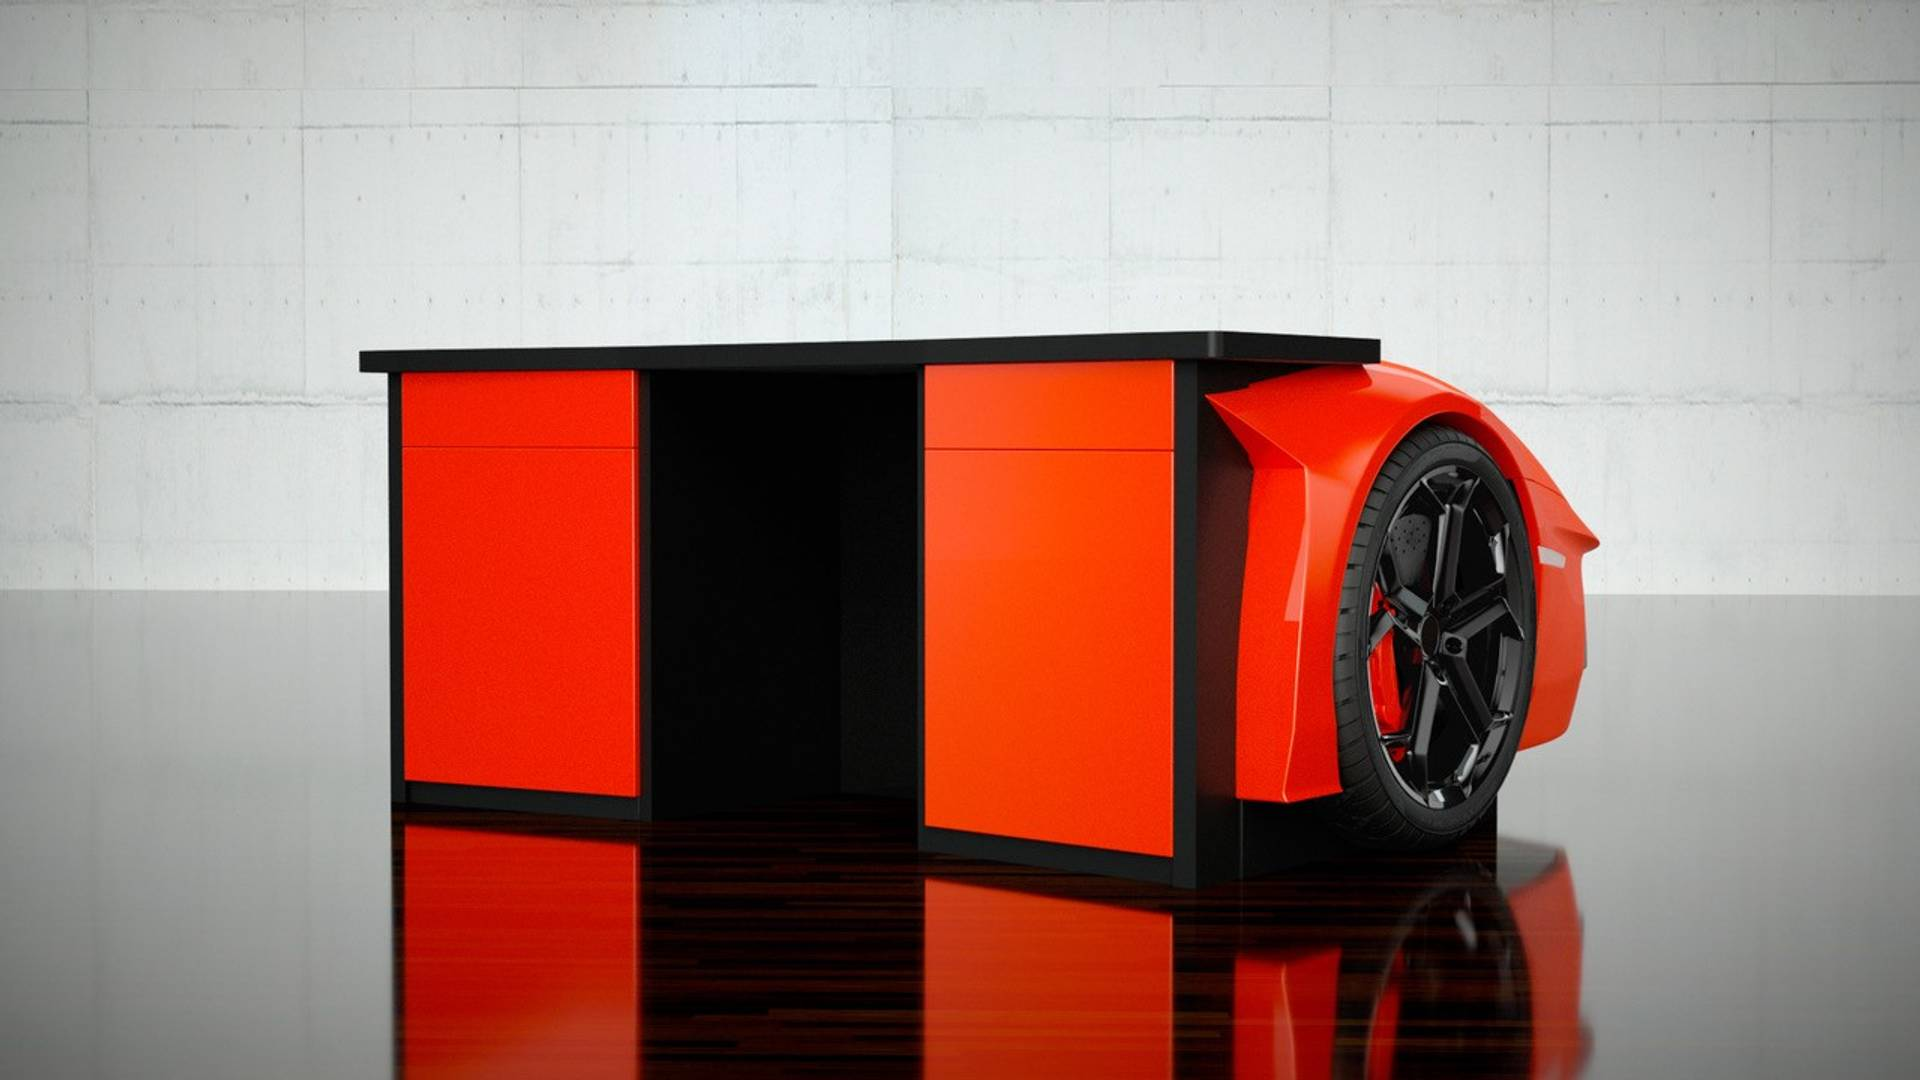 lamborghini-aventador-desk3.jpg